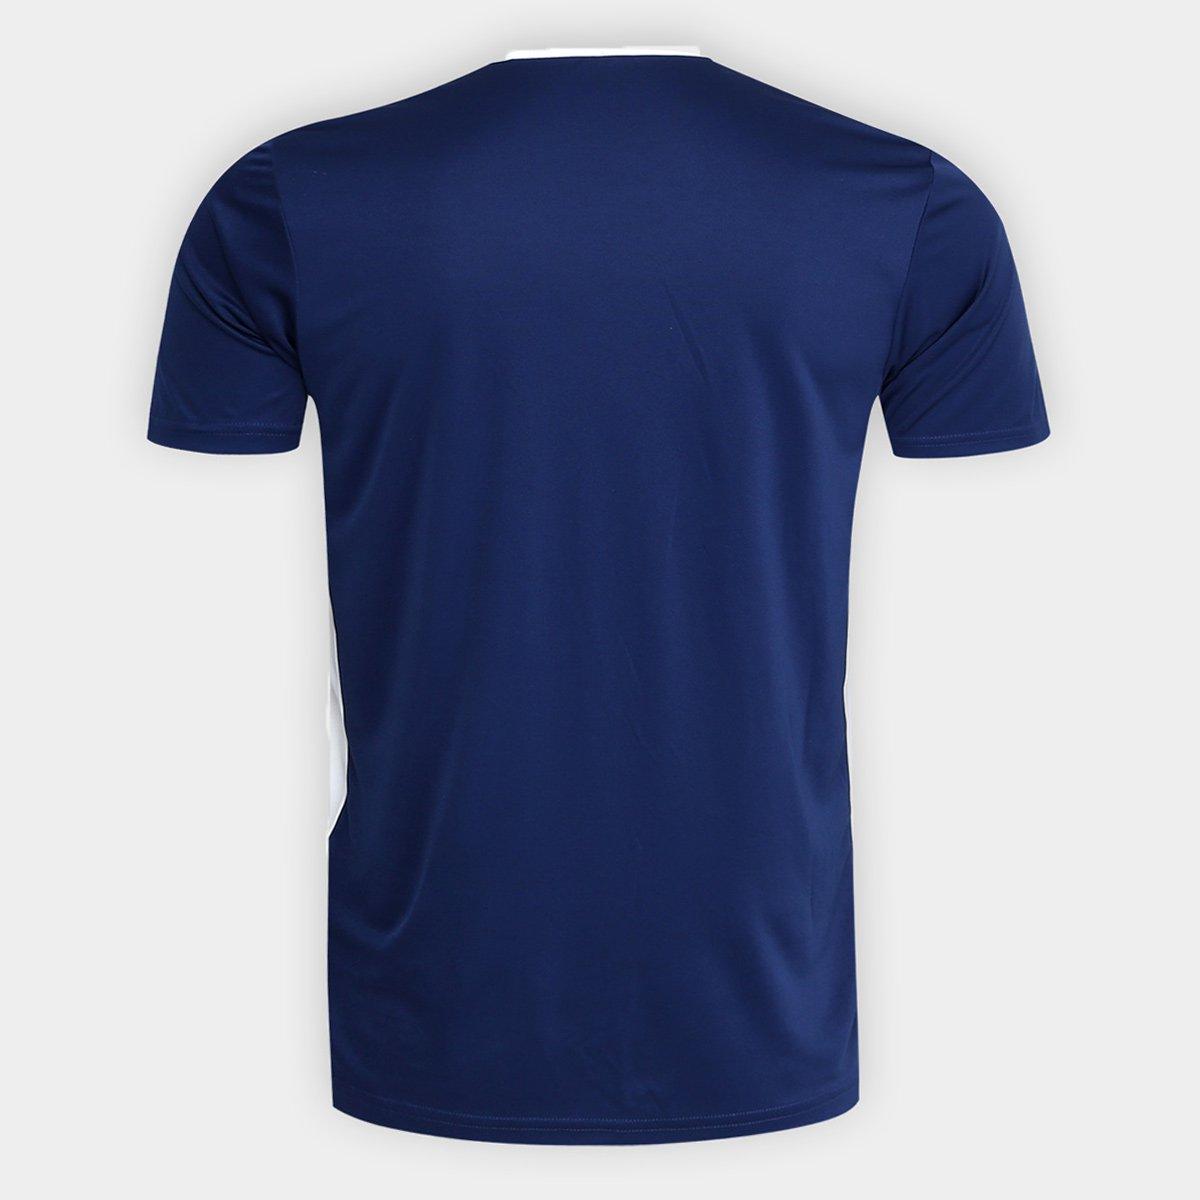 Camiseta Adidas Entrada 18 Masculina - Tam: P - 1